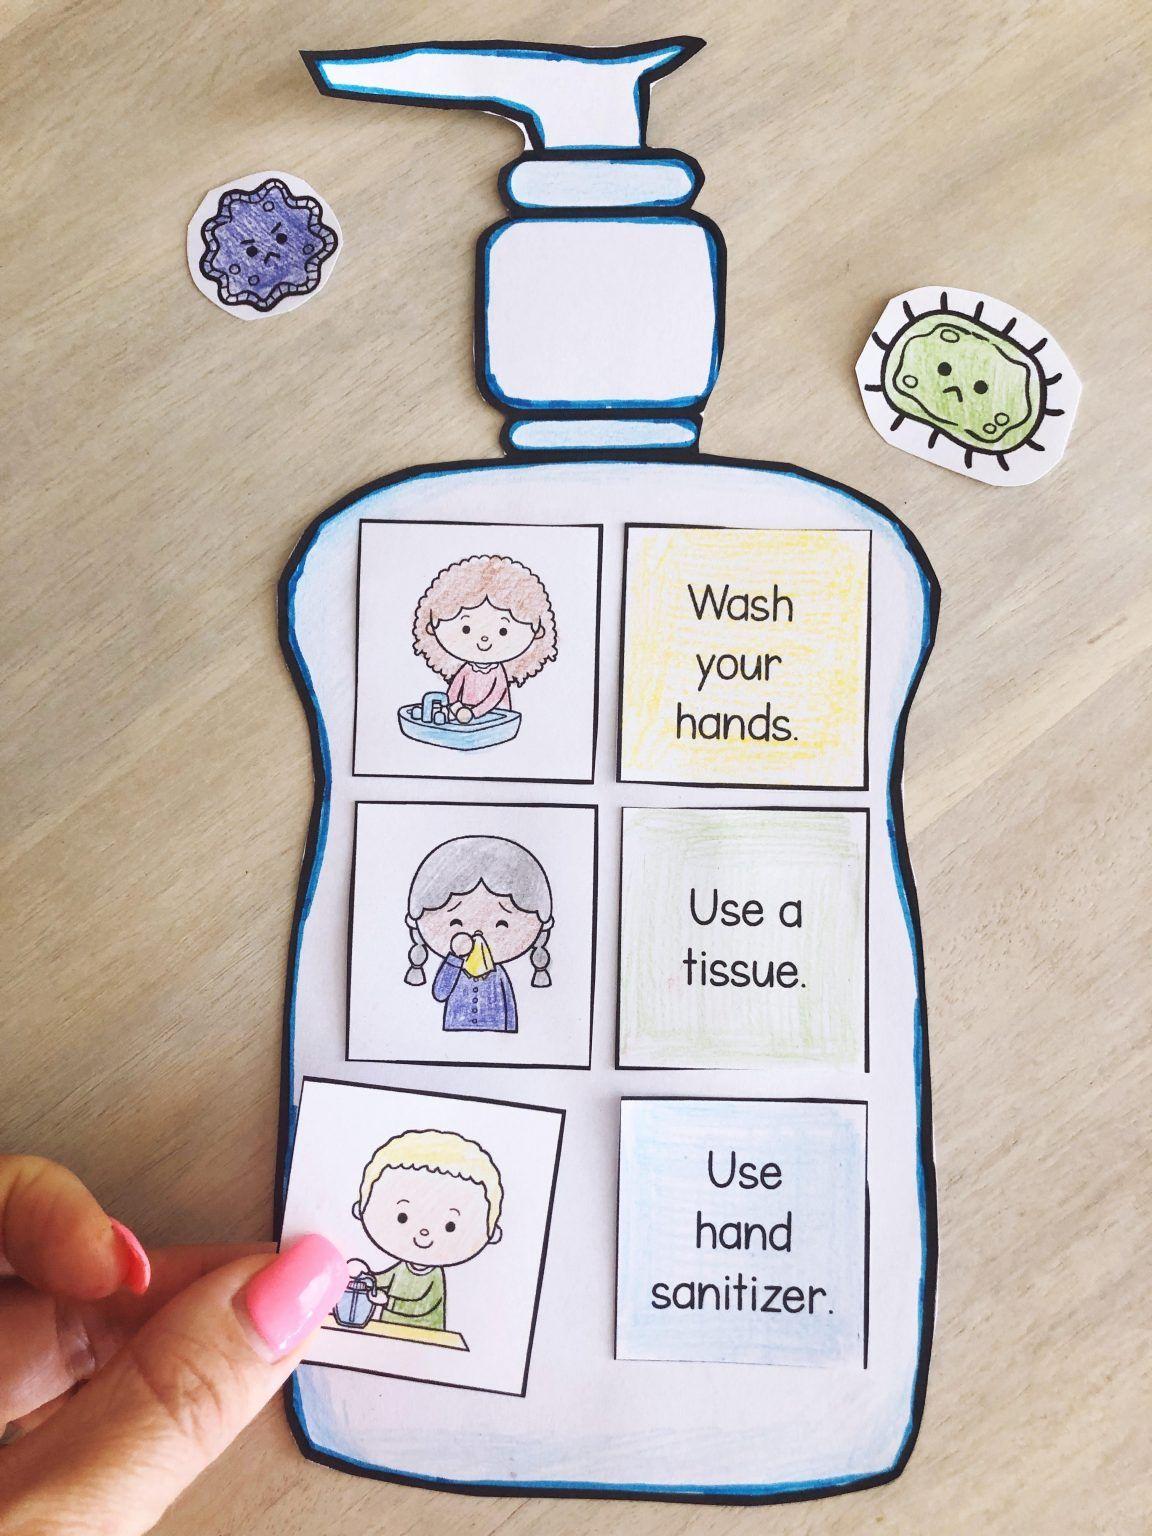 hygiene4 in 2020 | Preschool learning activities, Healthy ...